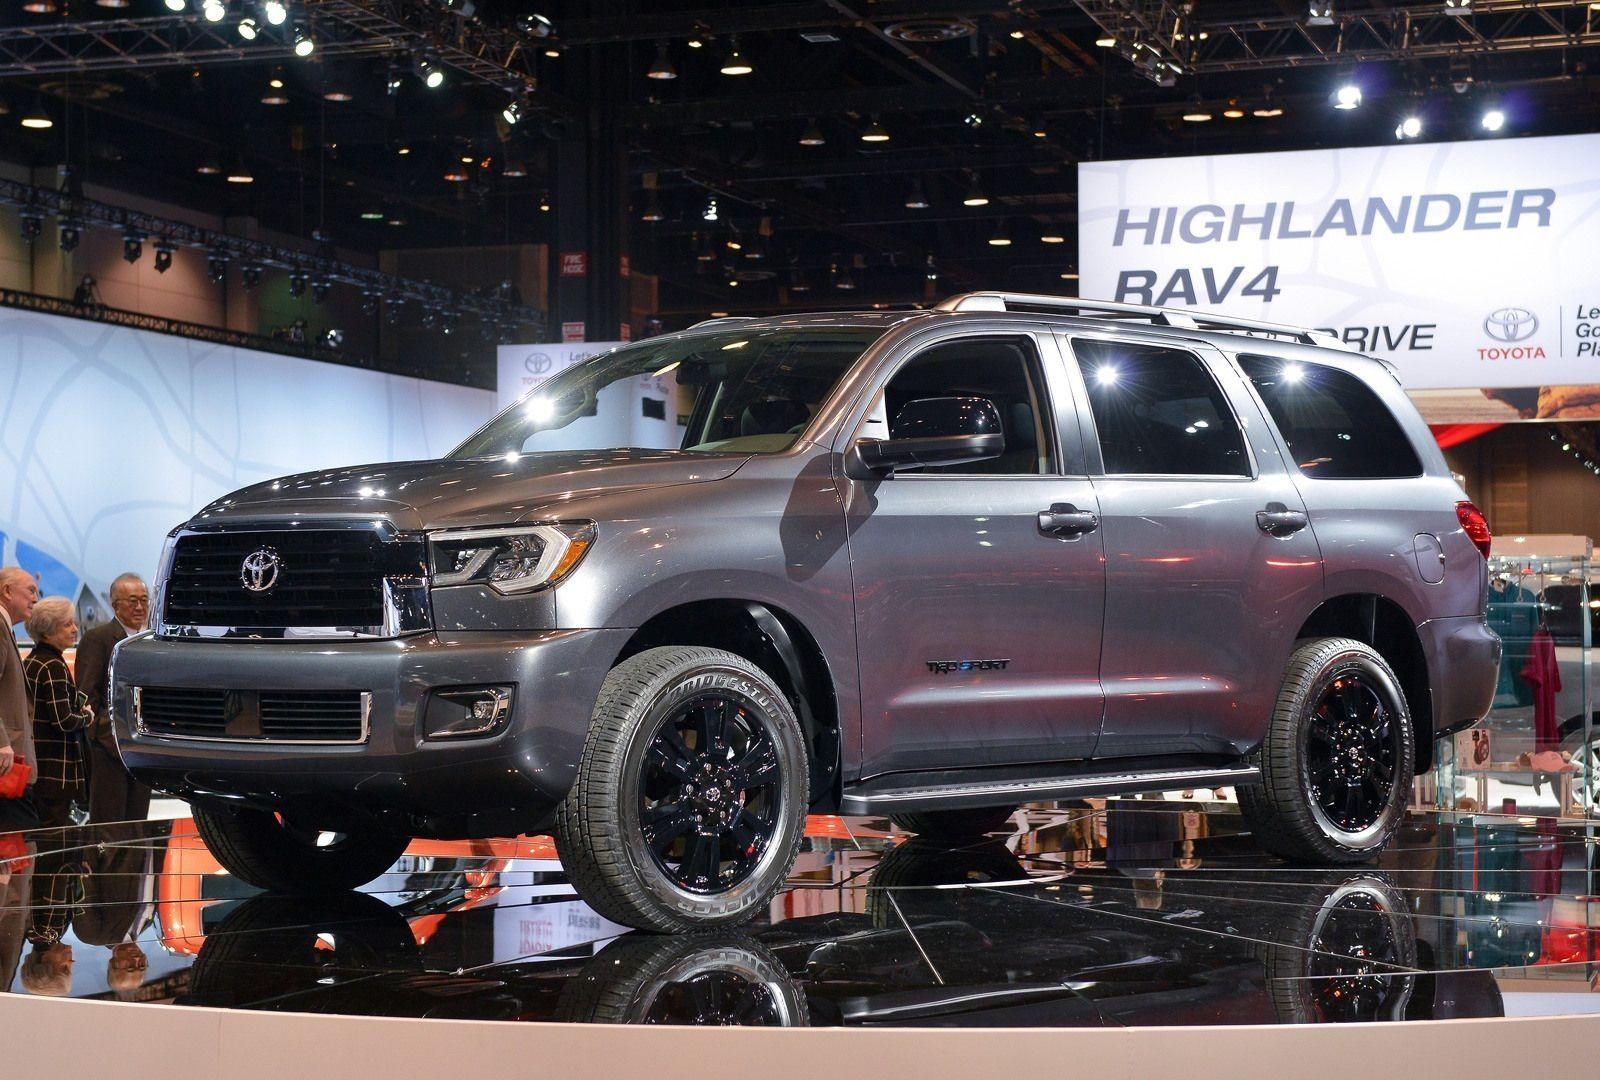 2020 Toyota Sequoia Redesign, Price & Release Date >> 2020 Toyota Sequoia Price And Release Date Cars Review 2019 Car